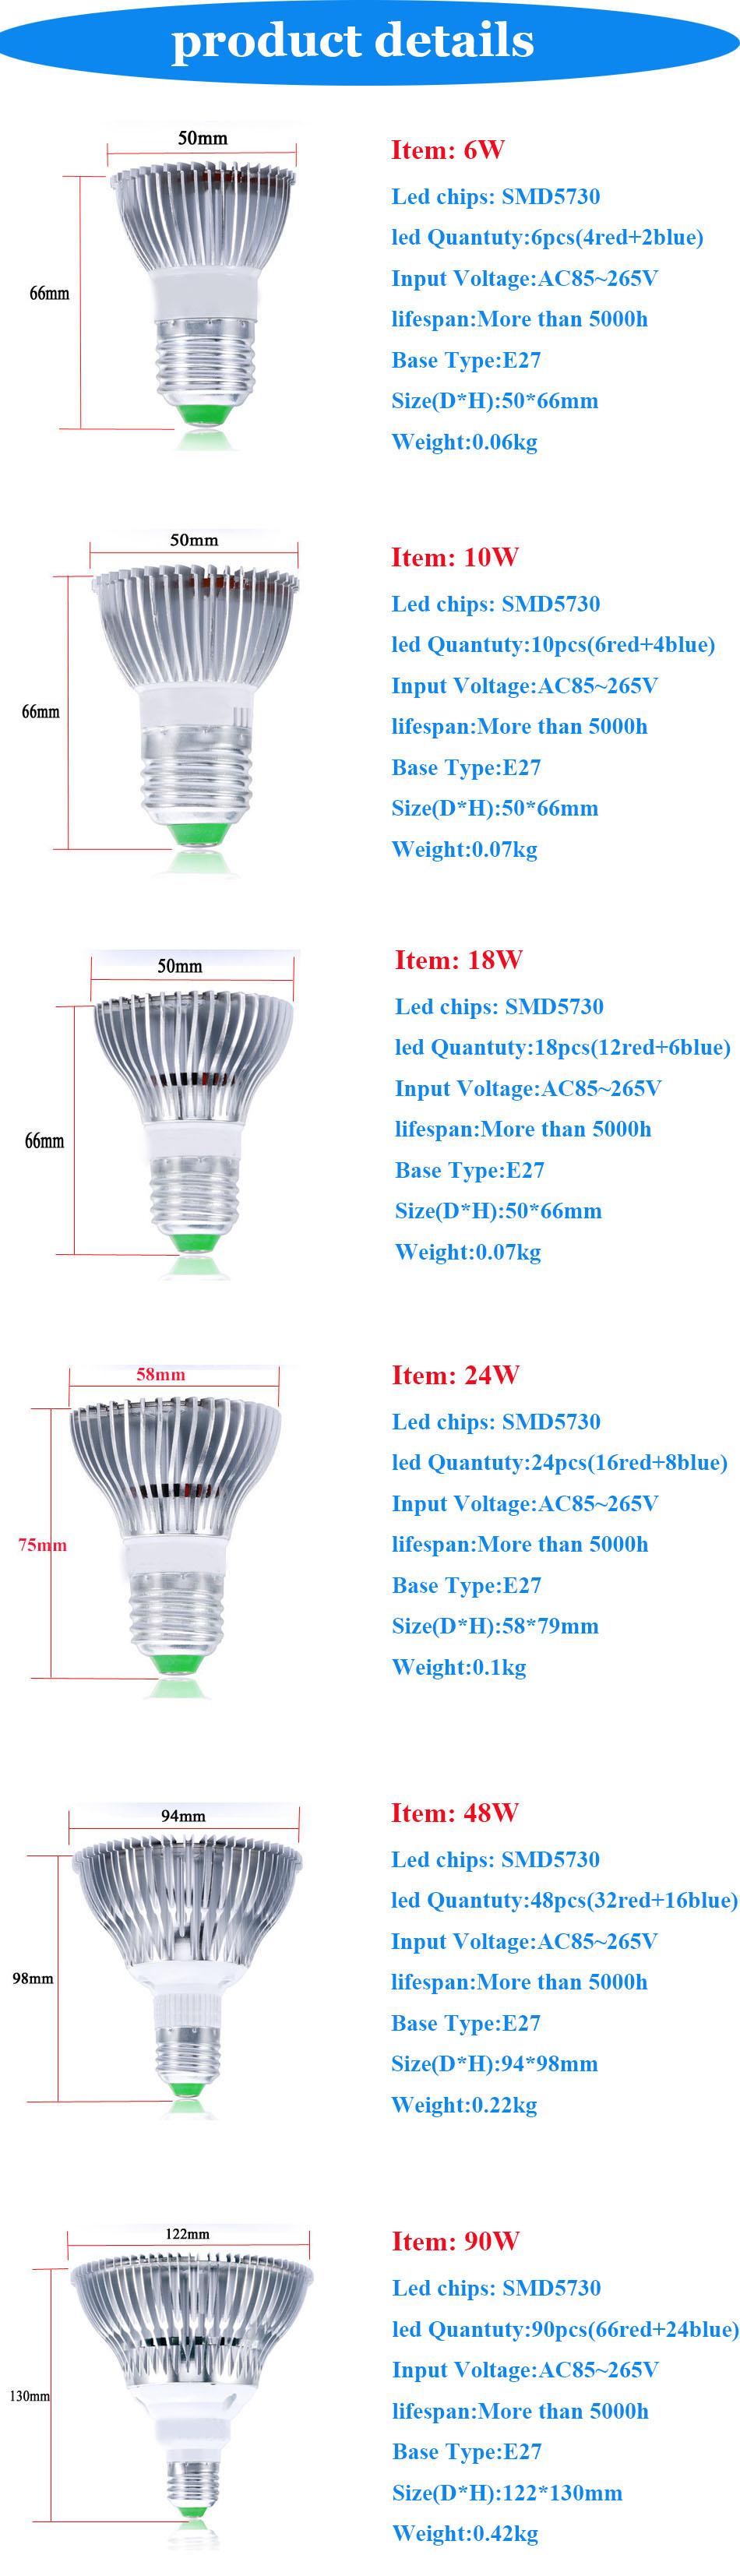 Grow Led Fitolampa Plant light  LED Grow Light E27 6W 10W 18W 24W 48W 90W Plant Light Bulb for  Plants Hydroponics AC85-265V AE